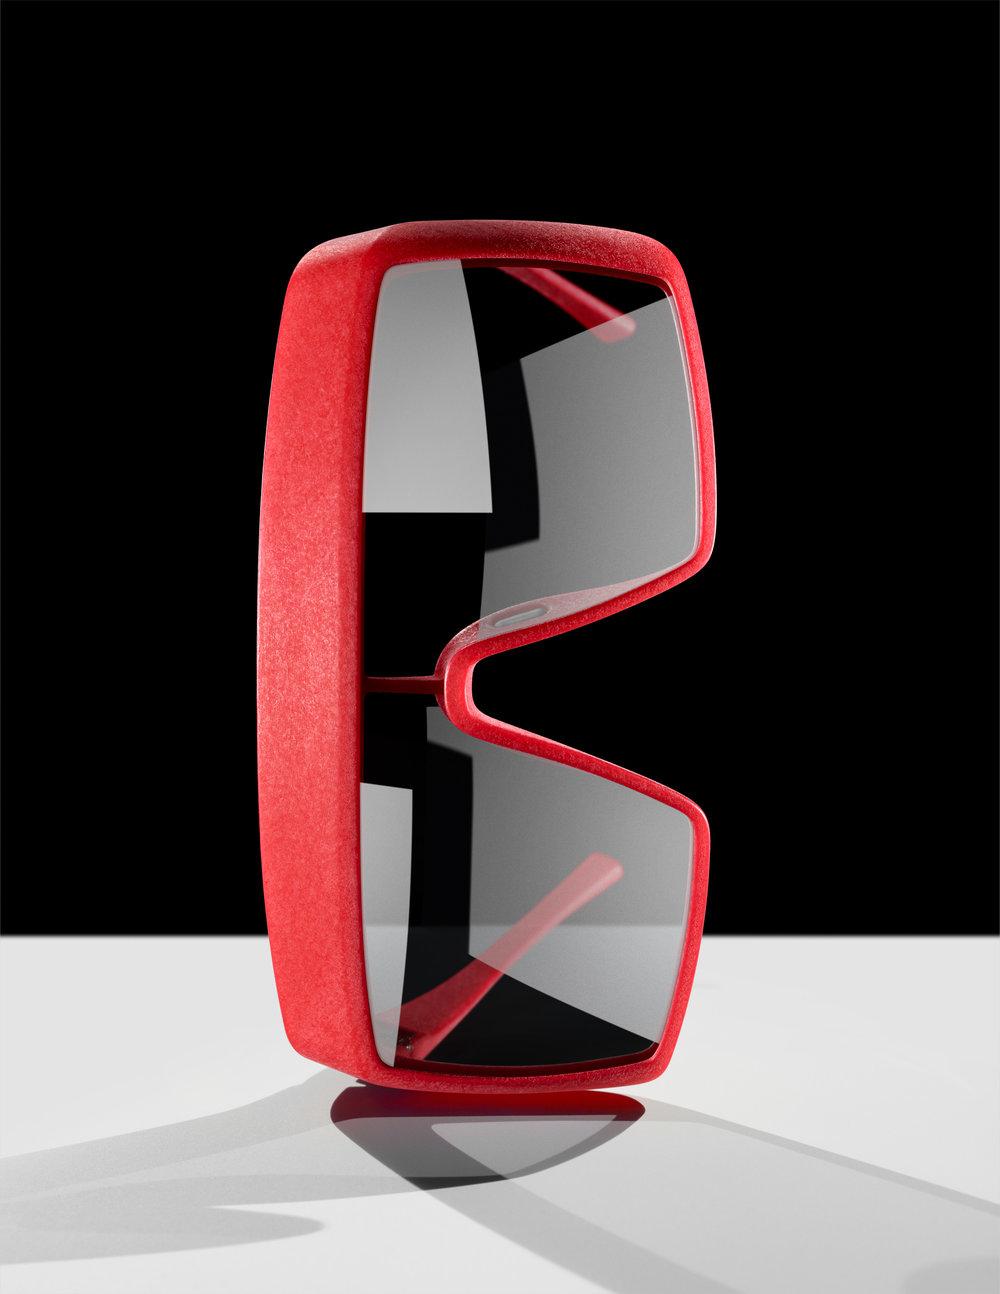 mykita-red-sunglasses-modern-futuristic-still-life-photographer-advertising-photography-stan-musilek